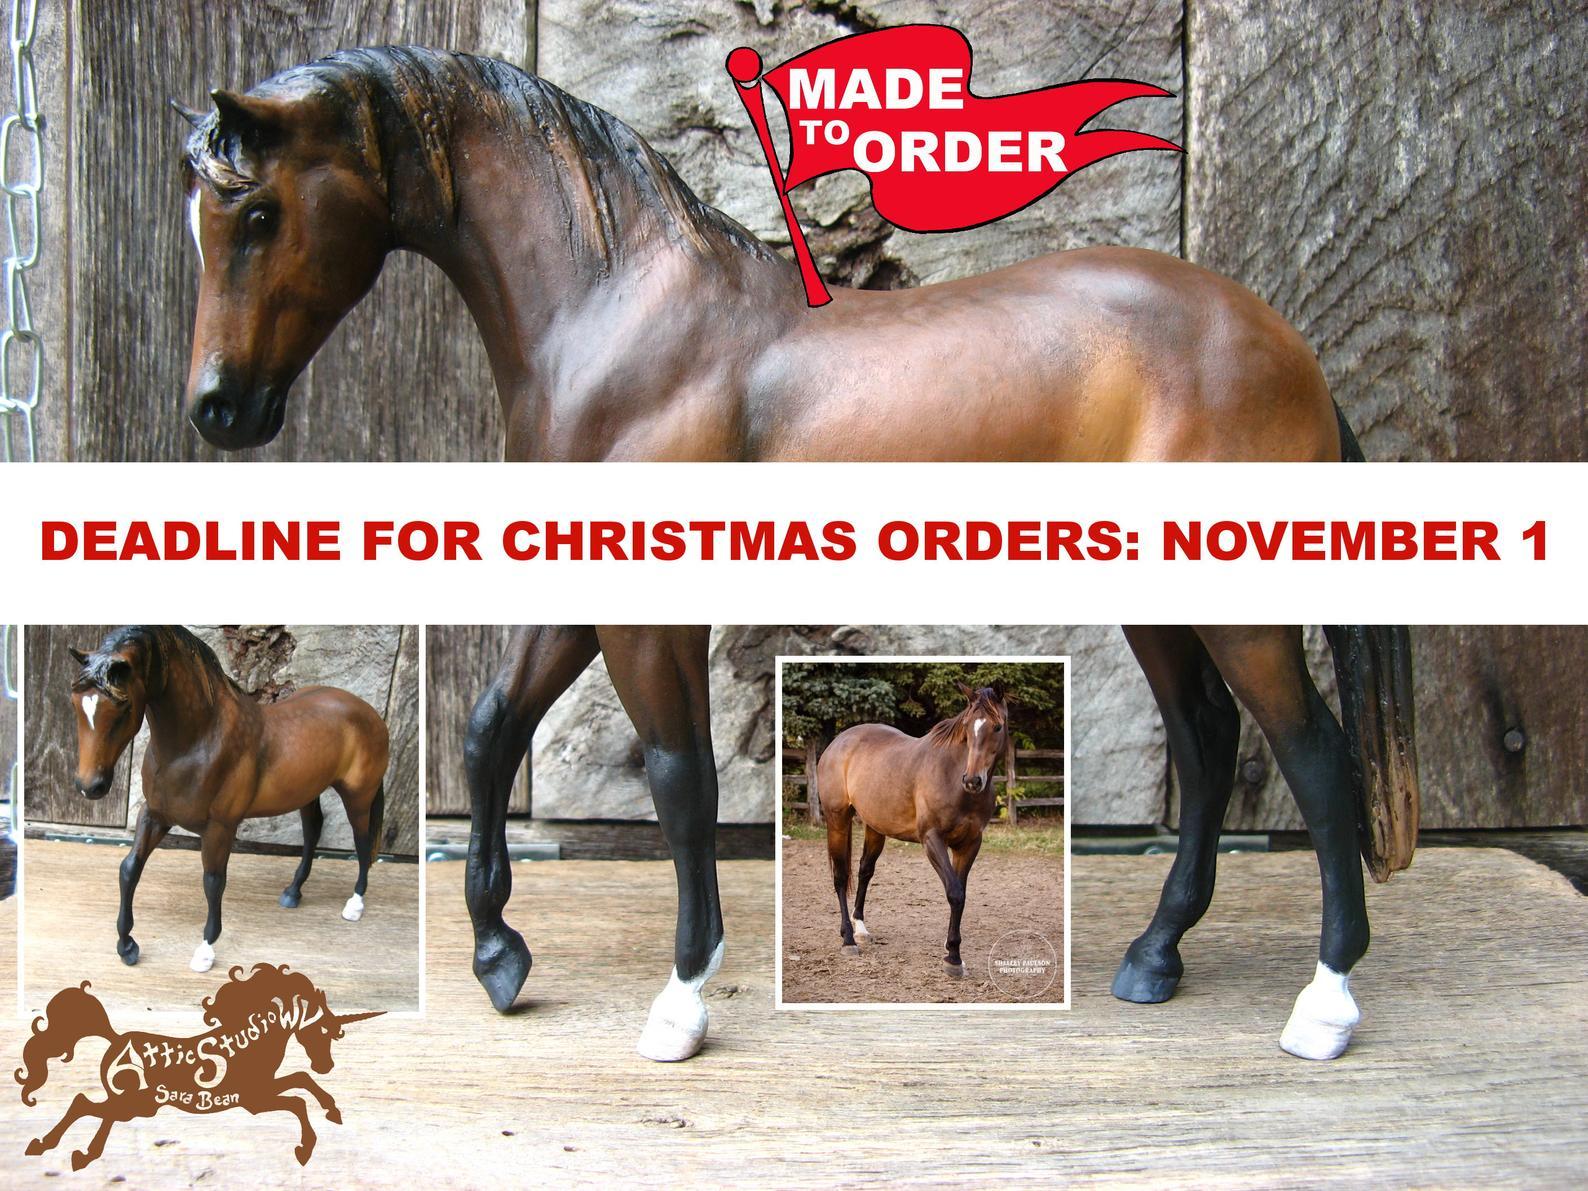 Custom Breyer Horse by Gifter World